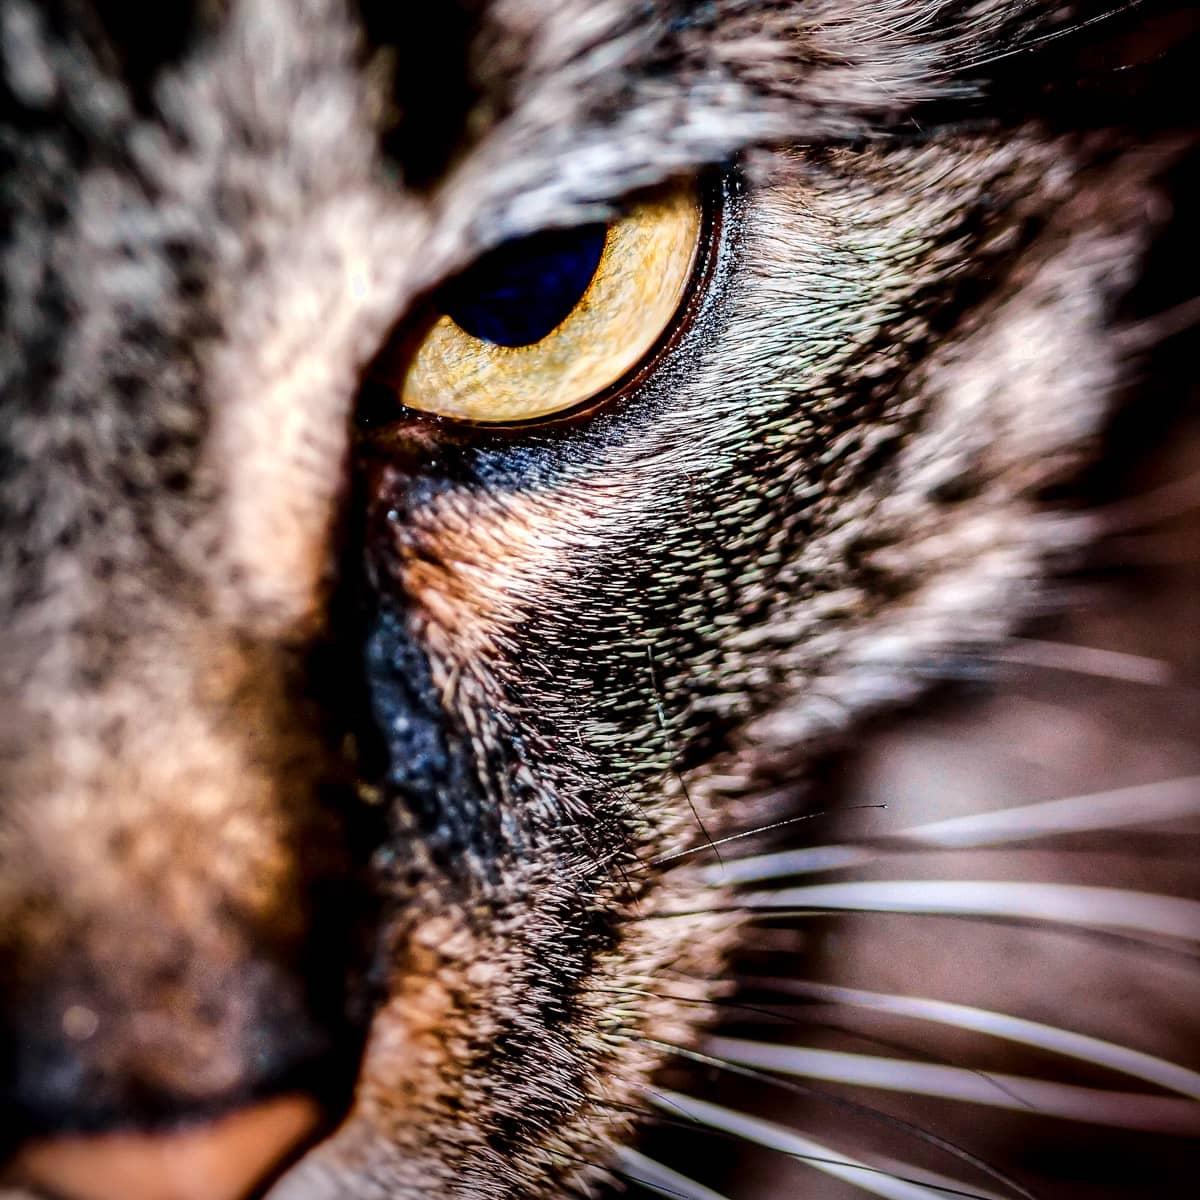 Our cat Miis' left eye.